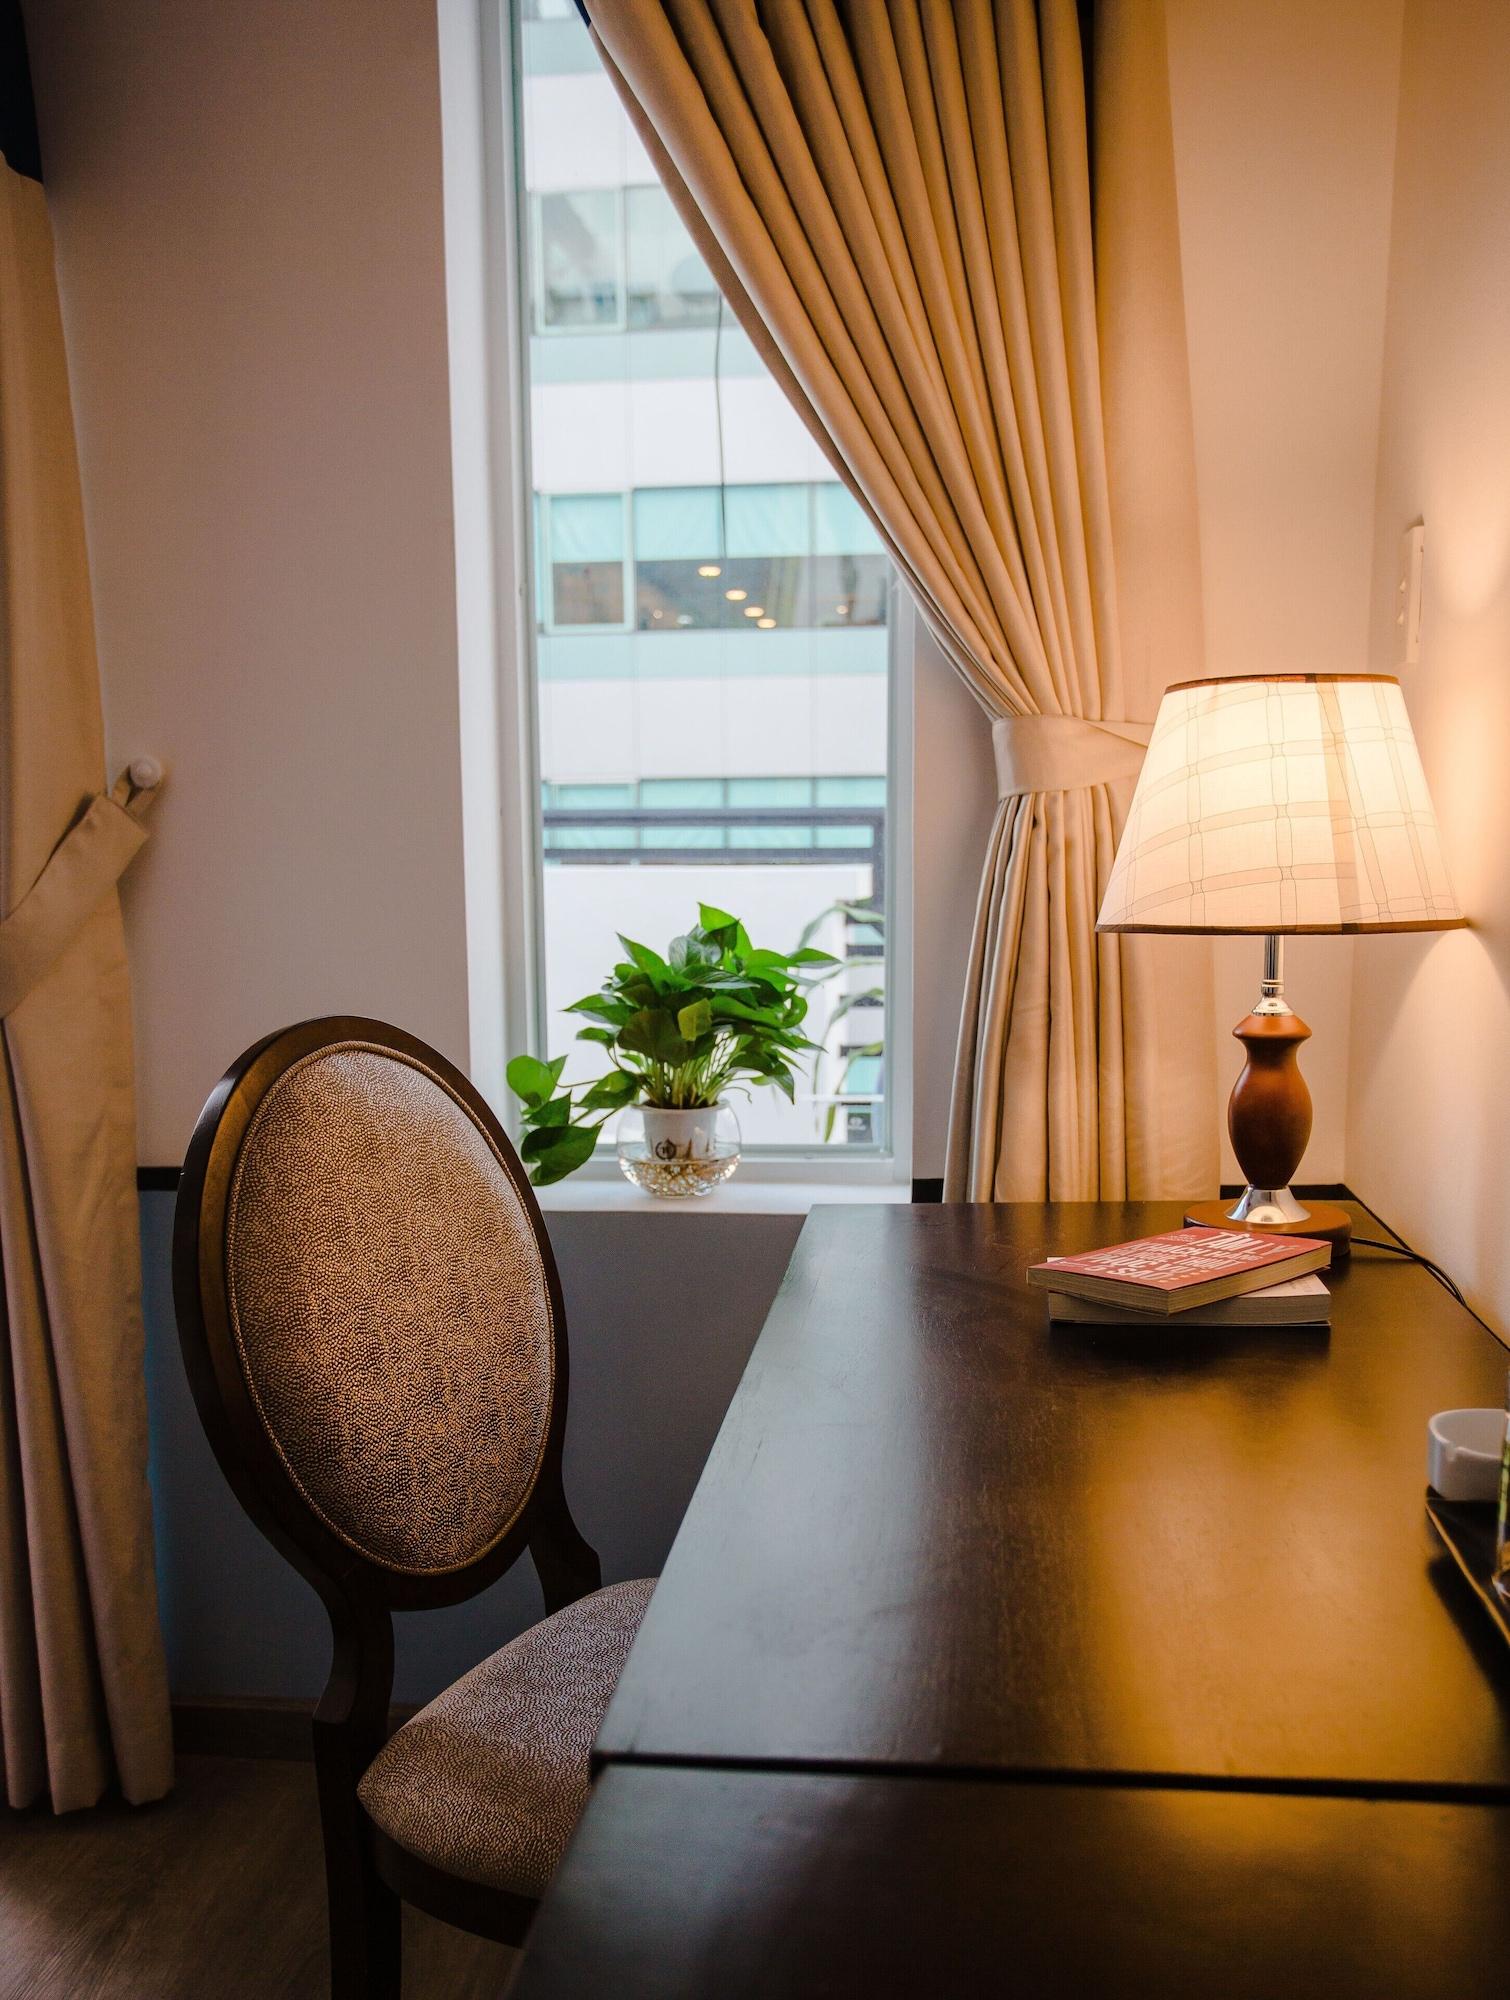 Happyhomes 28 Sai Gon Central Hotel, Quận 1